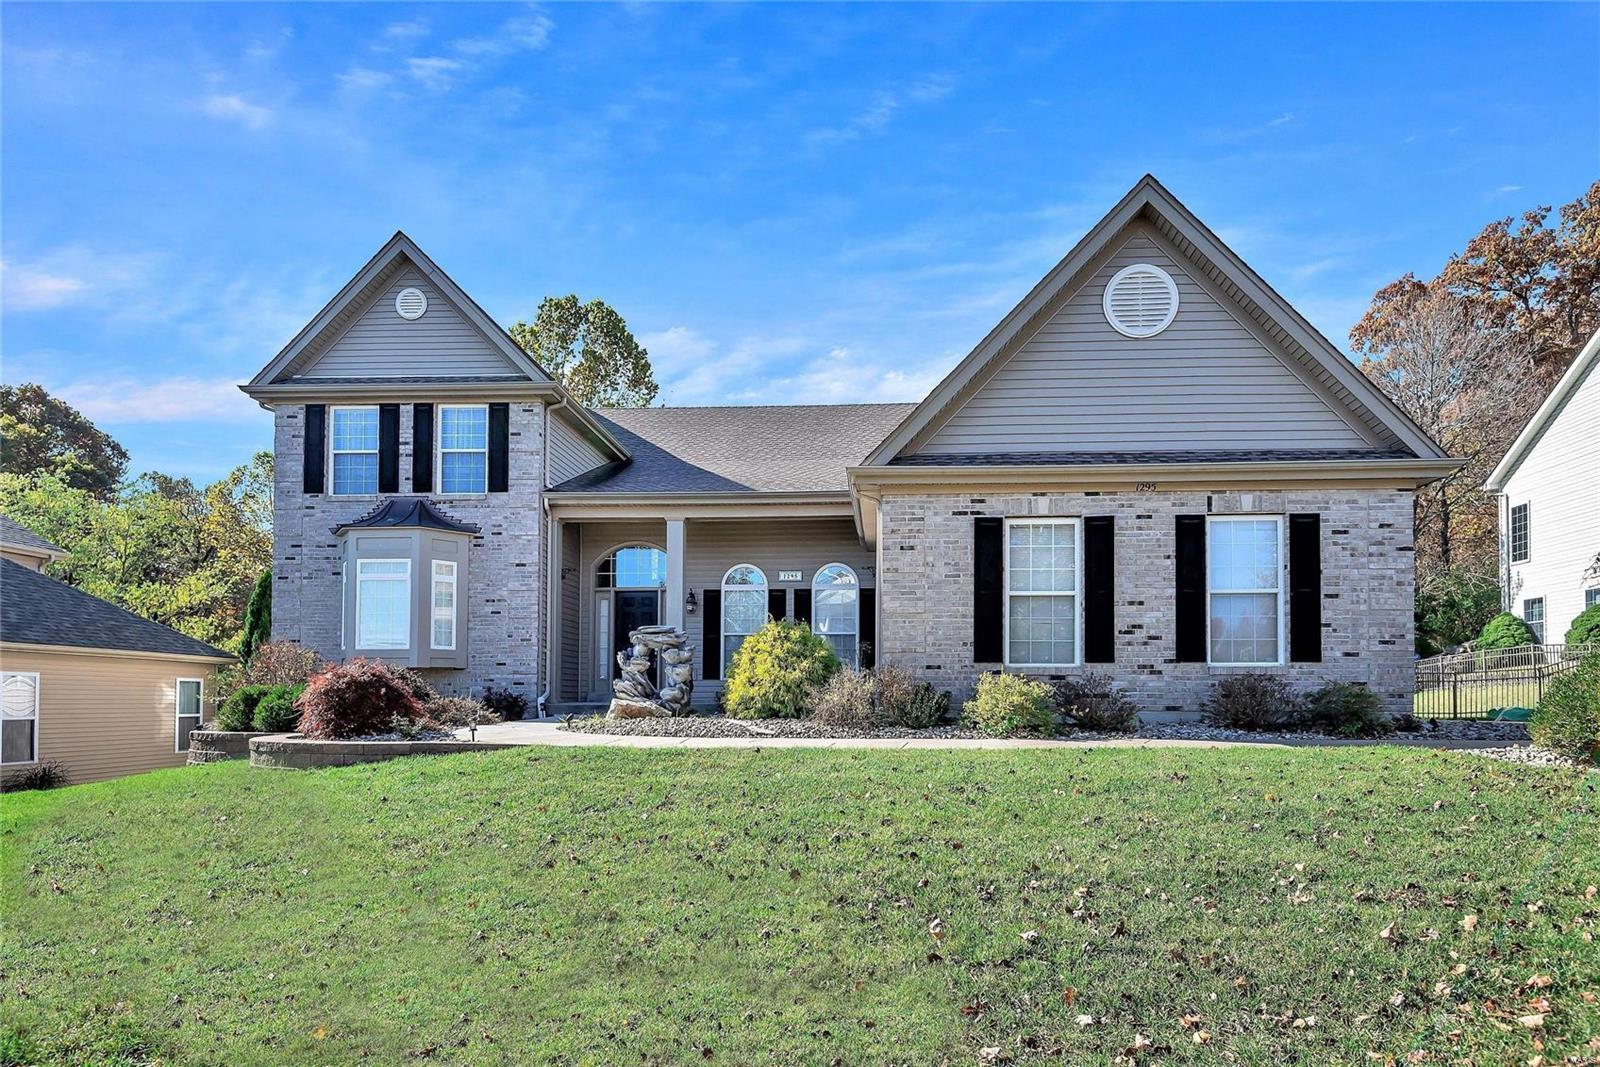 1295 Polo Lake Property Photo - Ellisville, MO real estate listing